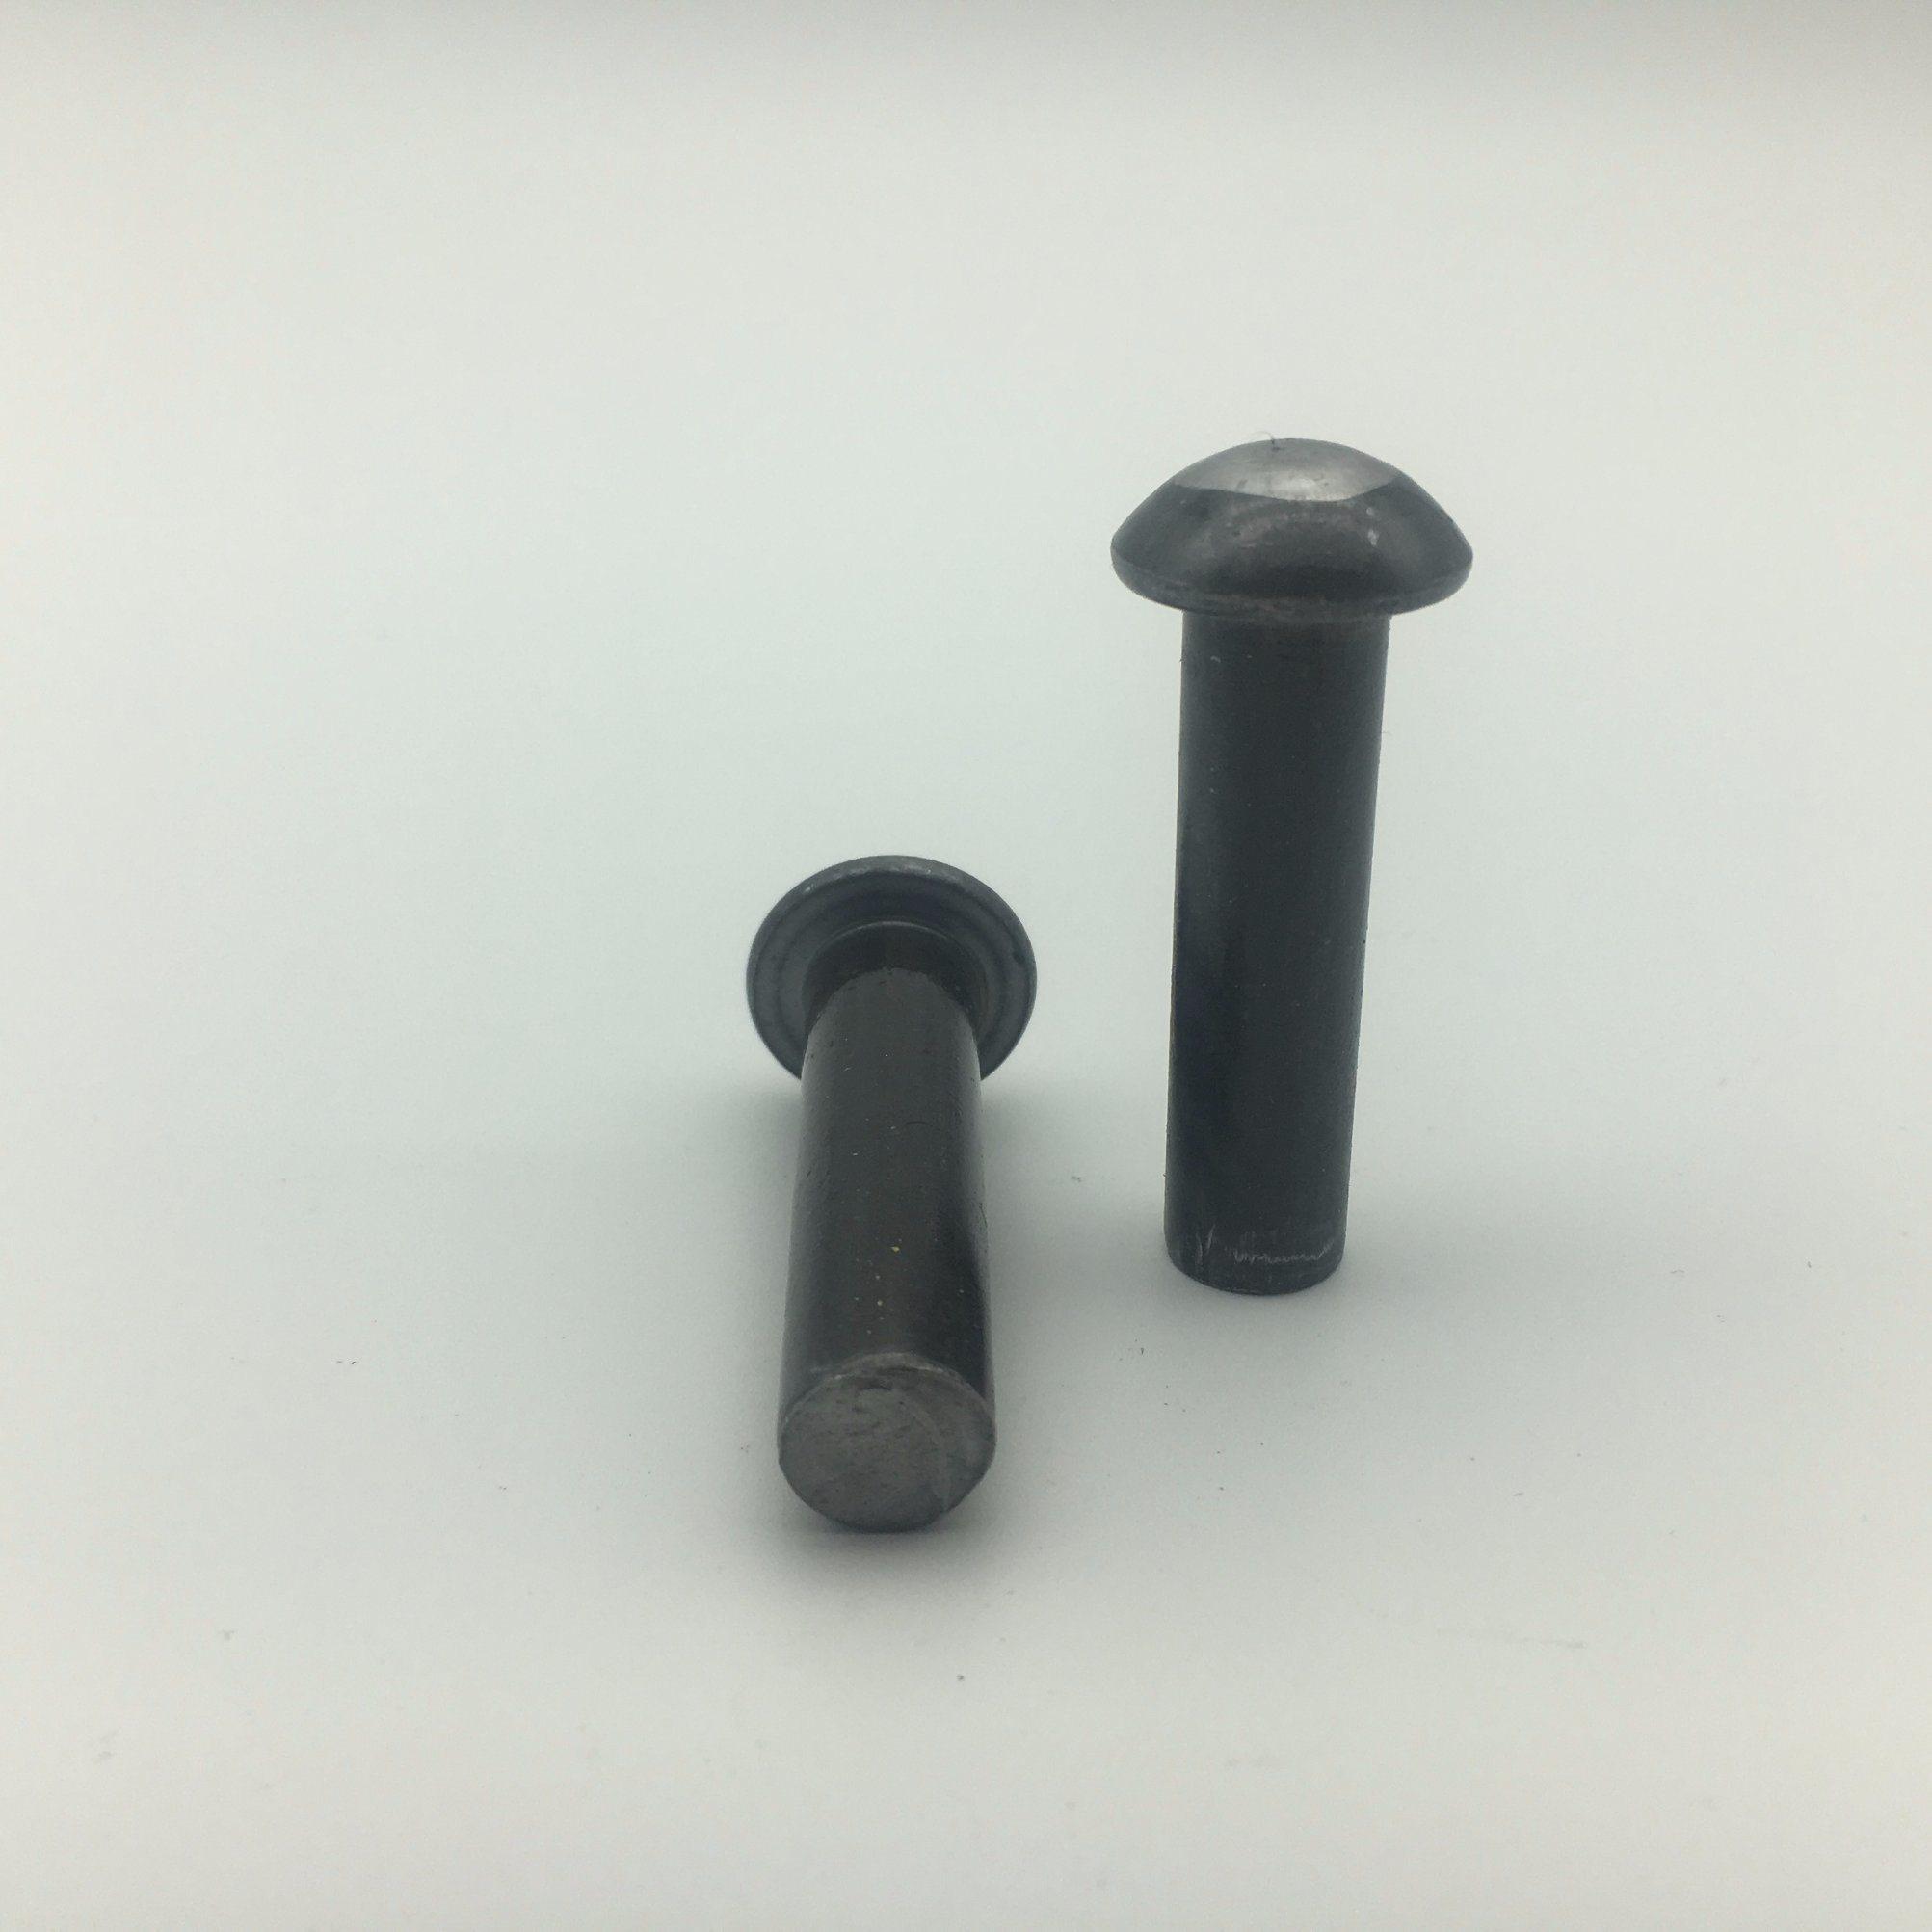 [Hot Item] Pan Head Rivet Screw Bolt Stainless Steel